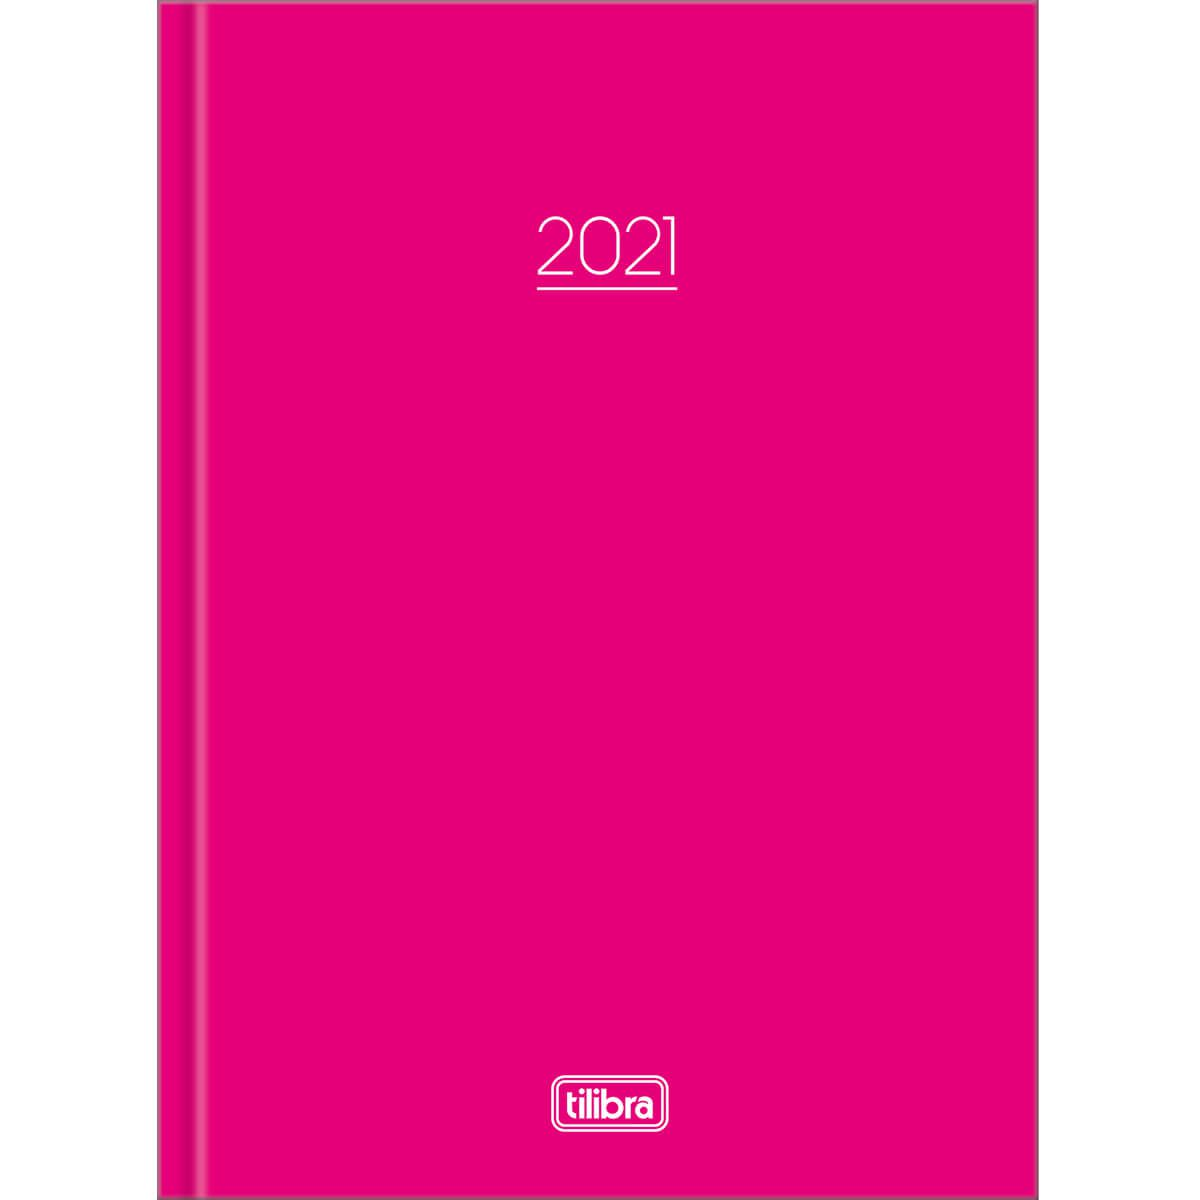 Agenda 2021 costurado 160 fls rosa Pepper M4 Tilibra